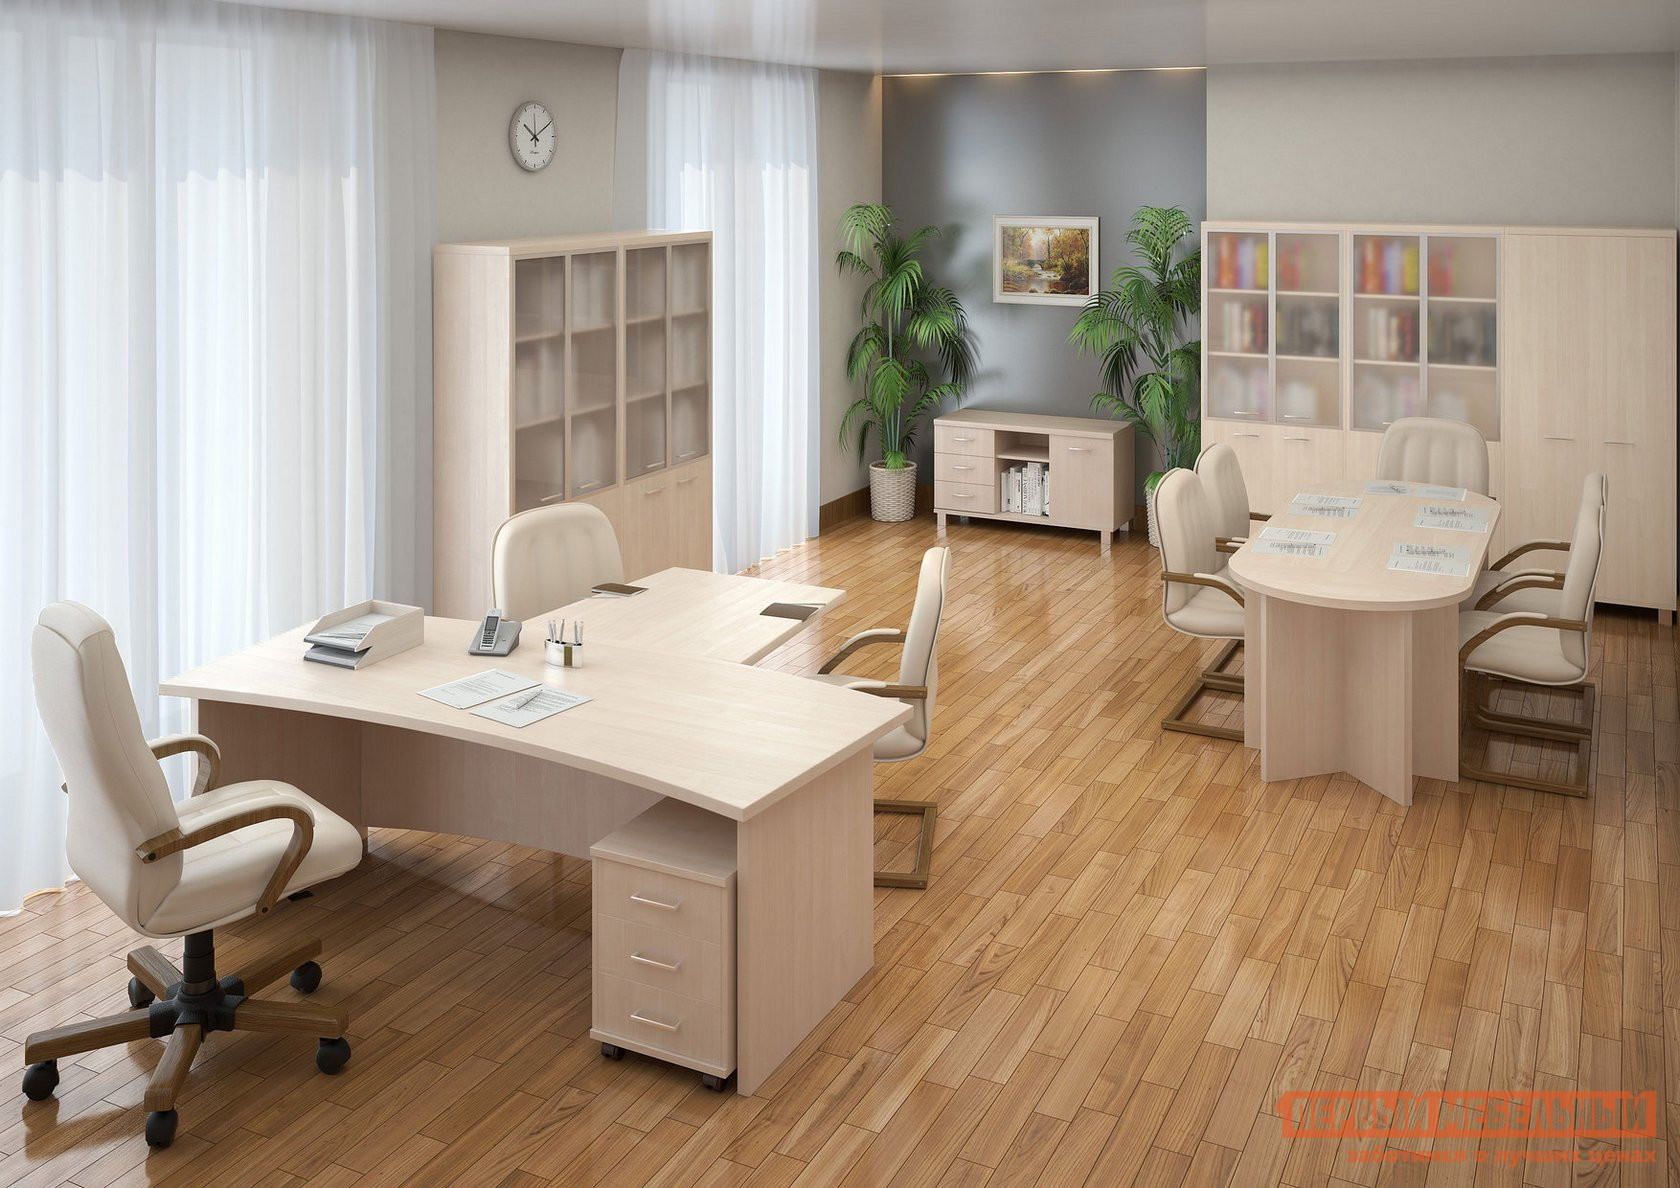 Комплект офисной мебели Riva Фёст Клен К1 комплект детской мебели мебельсон амели м к1